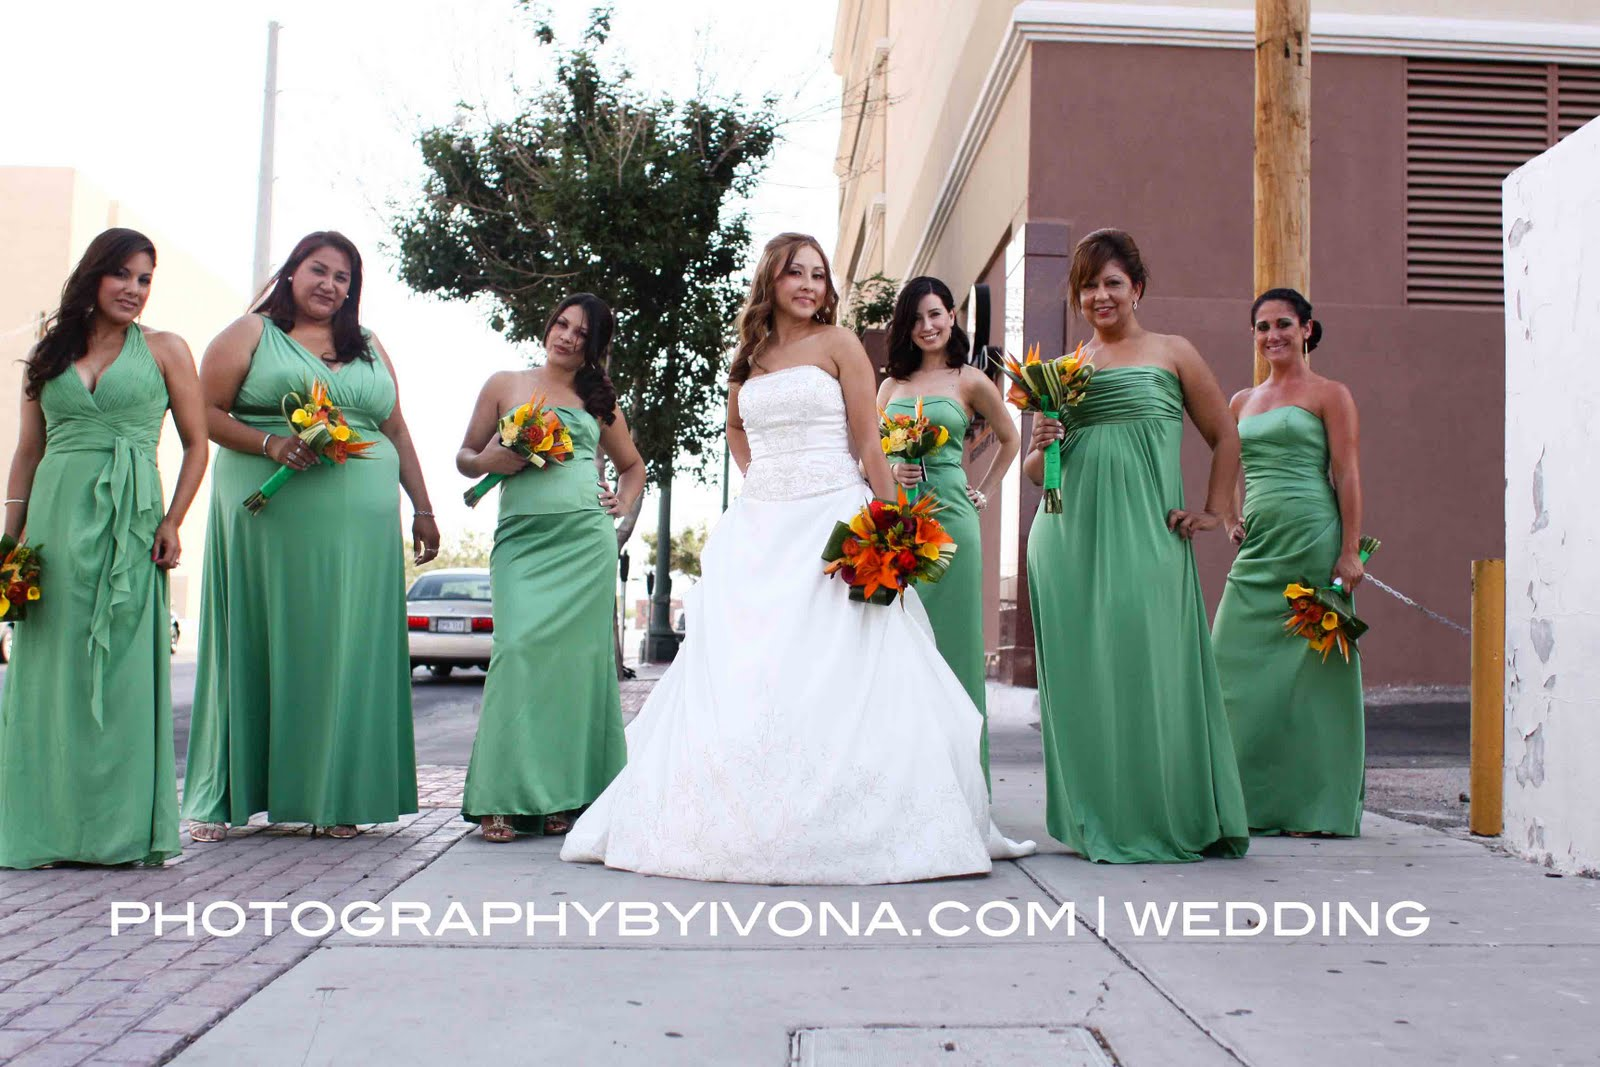 Christine joe el paso wedding photographer ivona for Wedding photographers in el paso tx